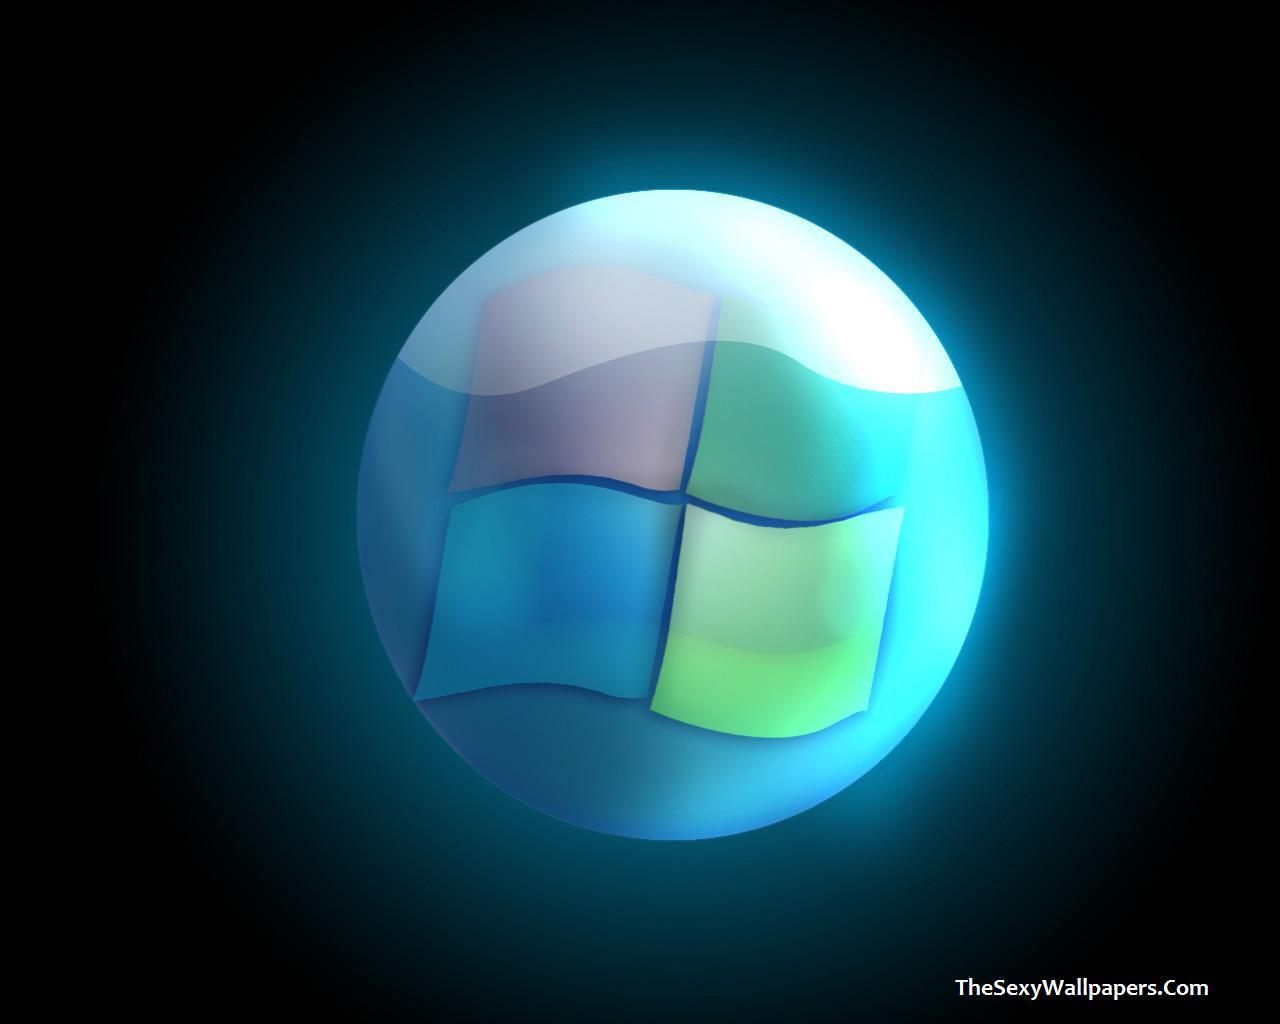 Windows Wallpaper Blog Animated windows wallpaper 1280x1024